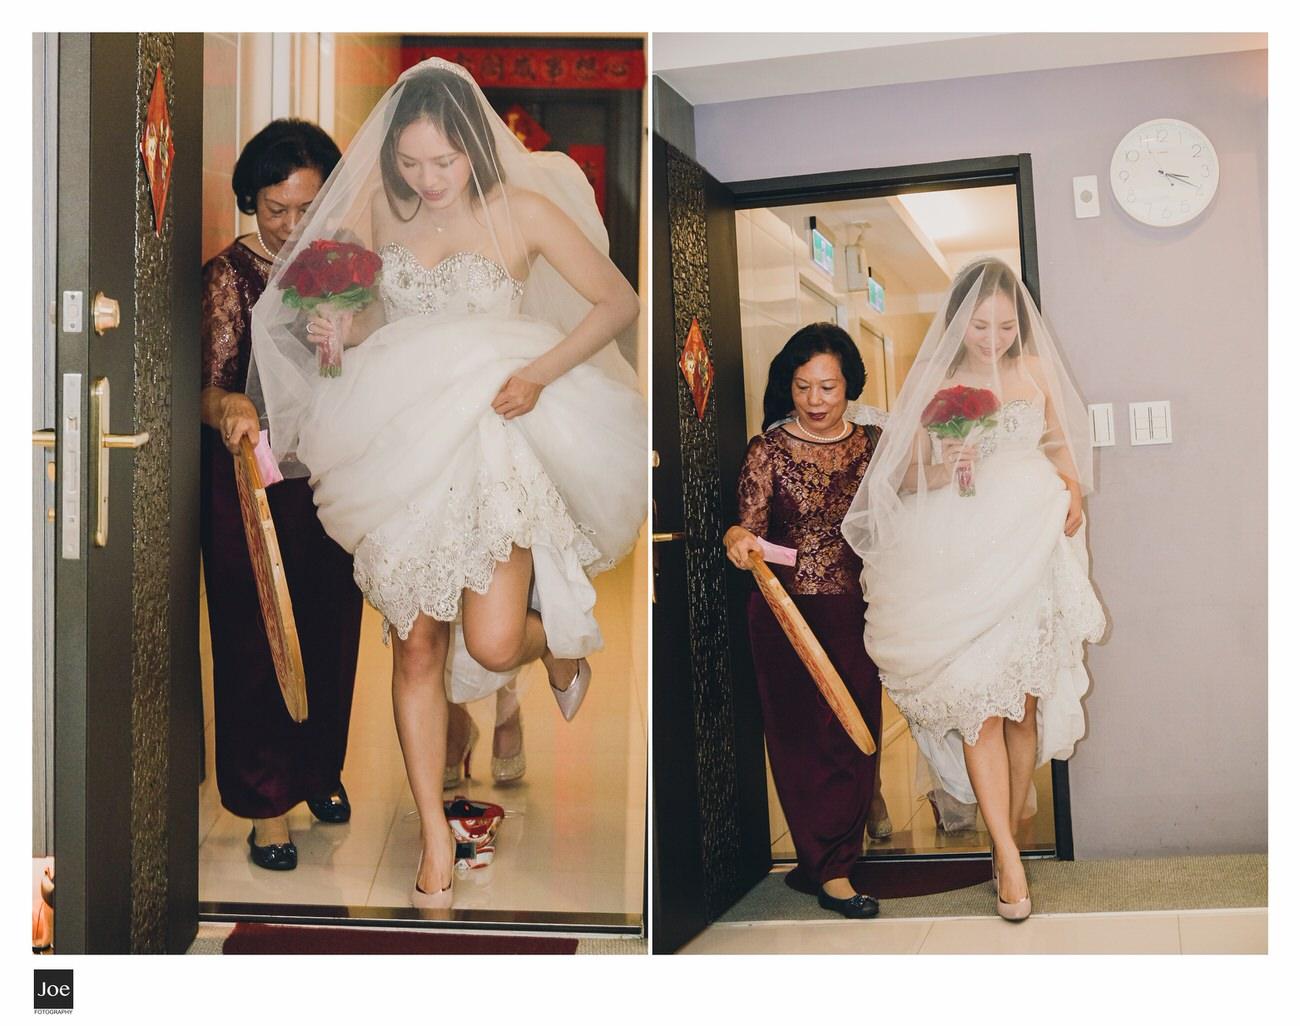 grand-hilai-hotel-wedding-daniel-yvette-joe-fotography-084.jpg